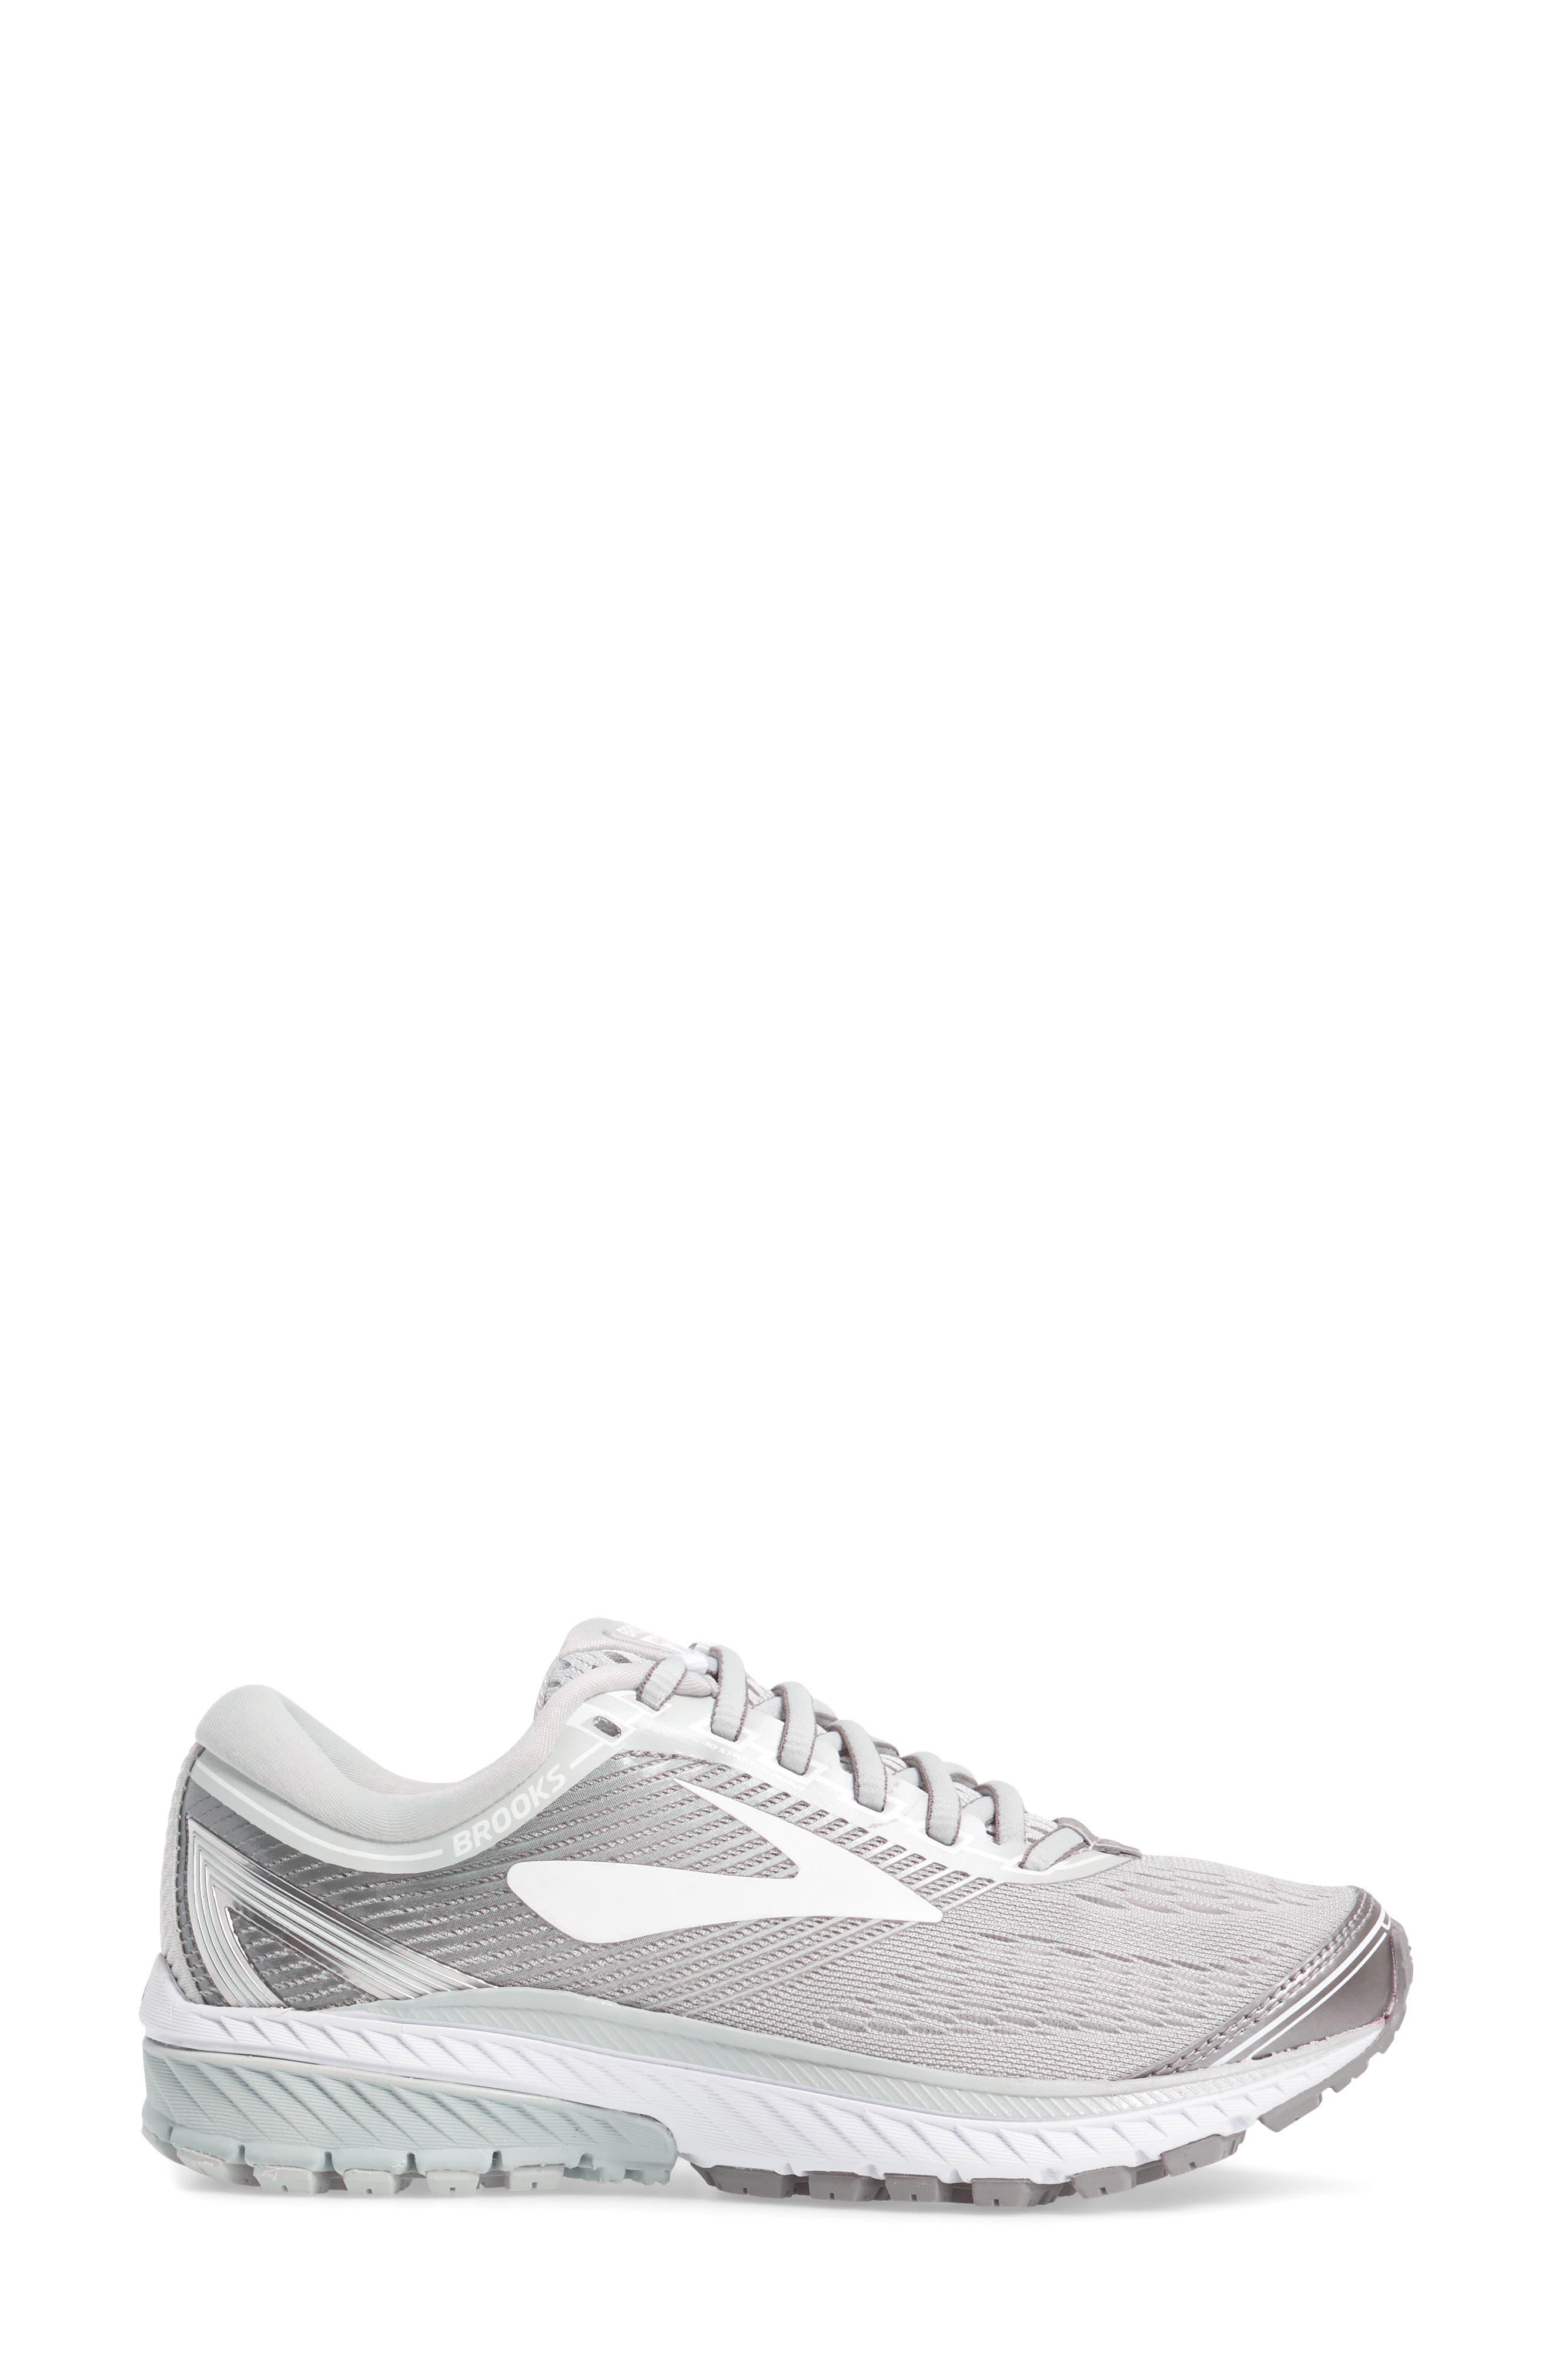 Ghost 10 Running Shoe,                             Alternate thumbnail 22, color,